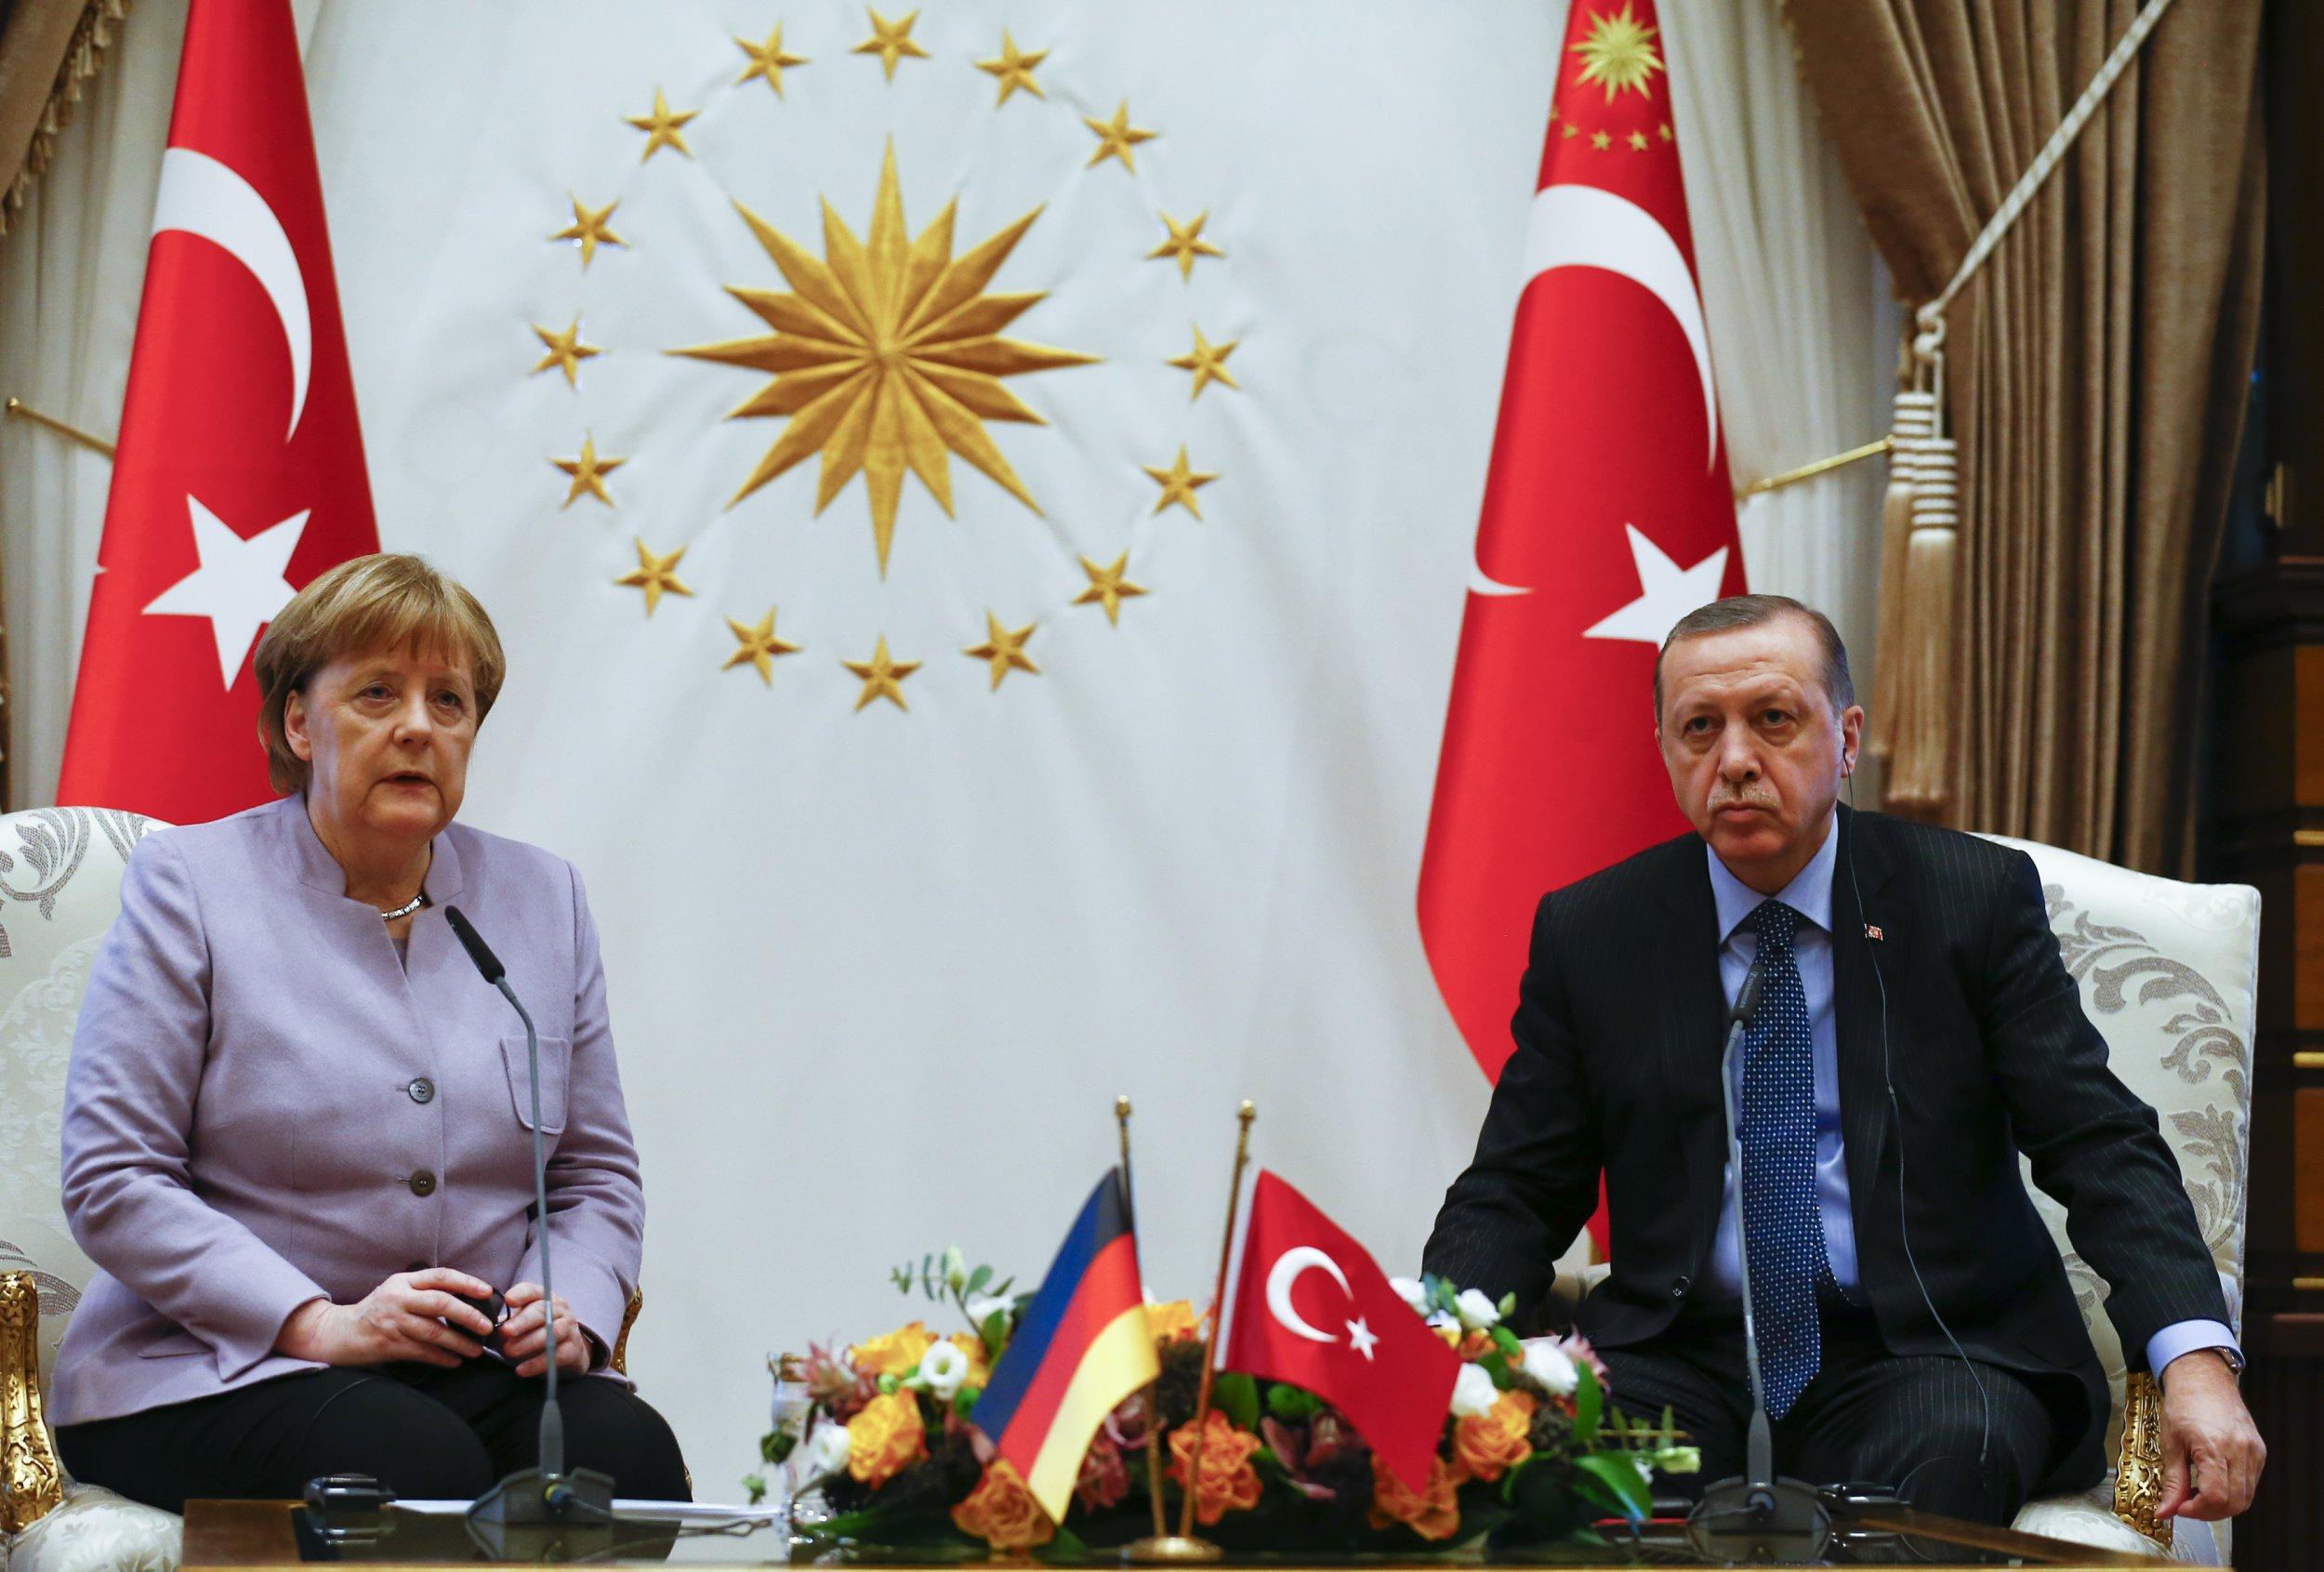 Angela Merkel President Recep Tayyip Erdogan